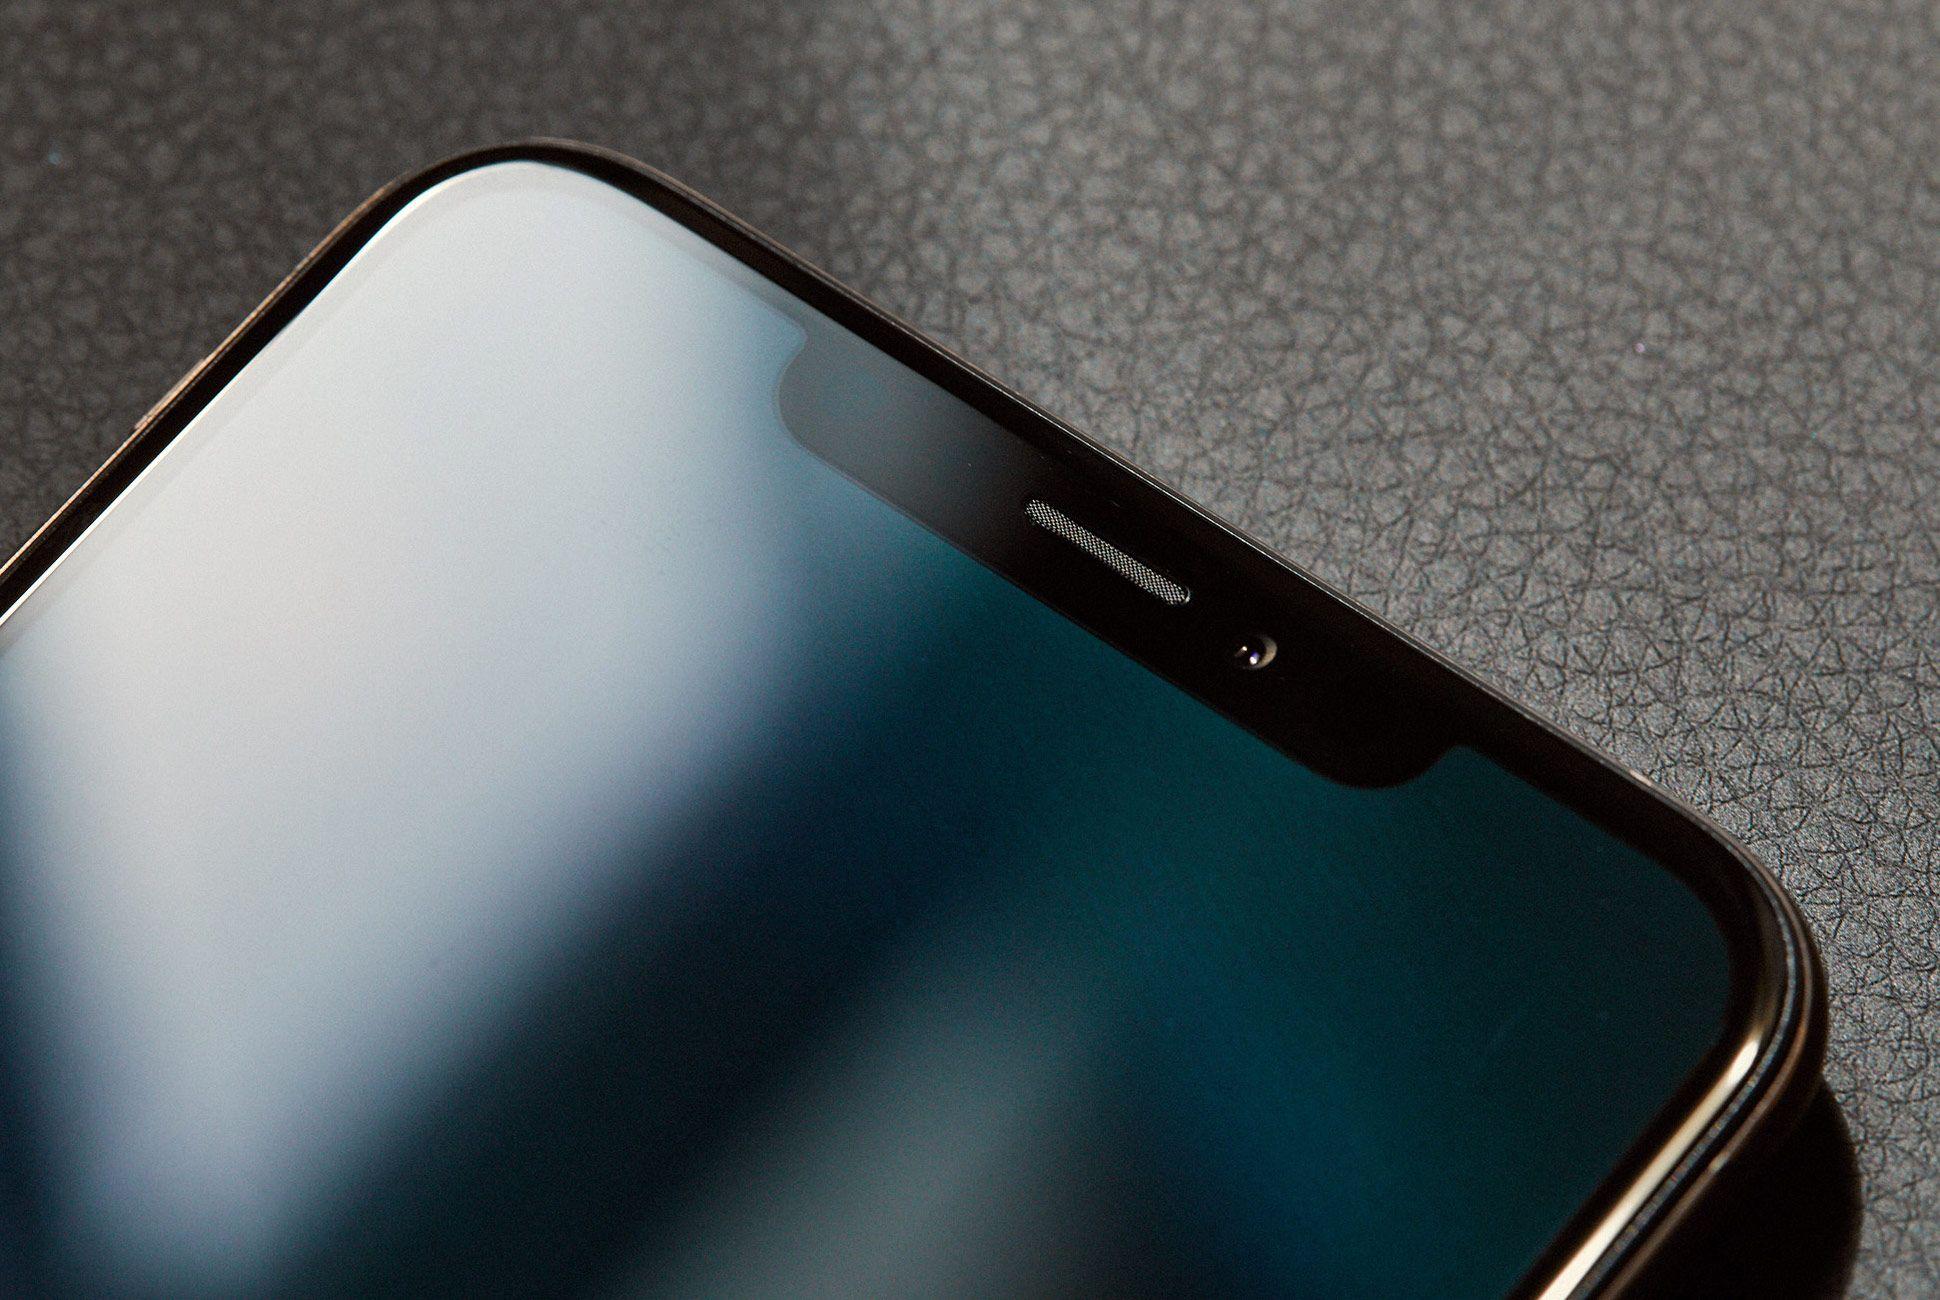 Iphone-X-XS-Review-Gear-Patrol-Slide-5